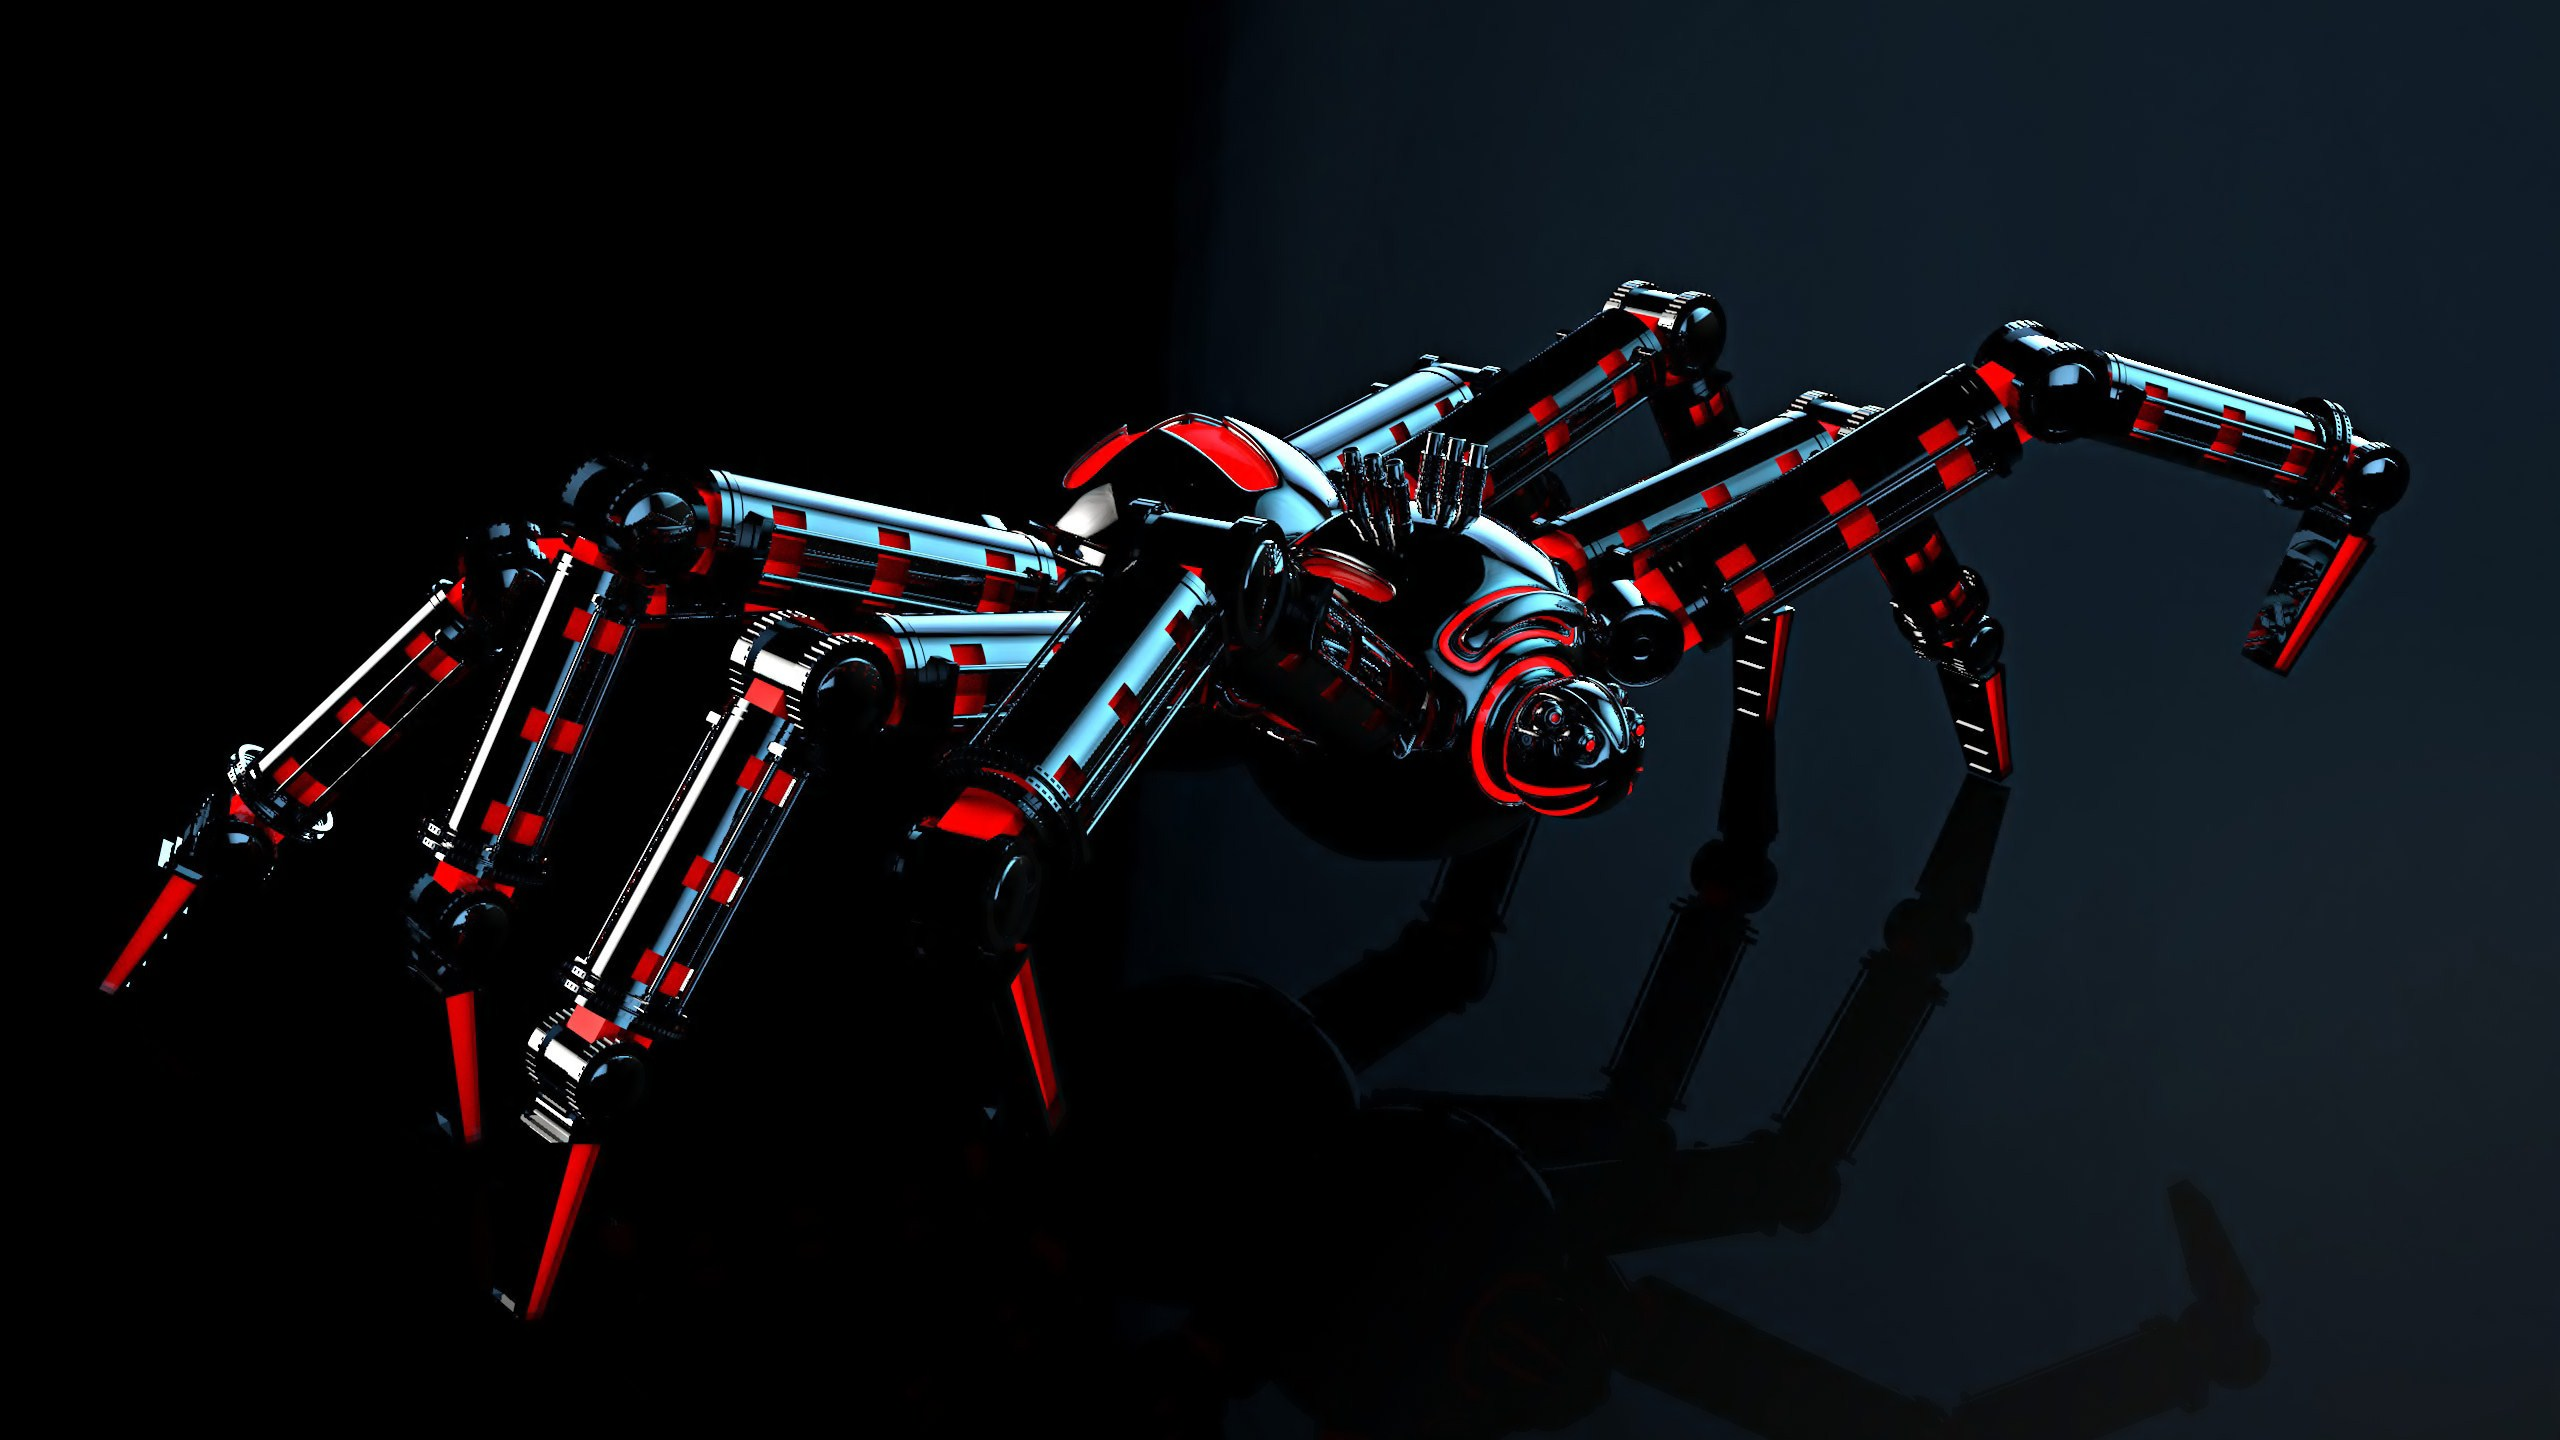 Black Widow HD Wallpaper - WallpaperSafari